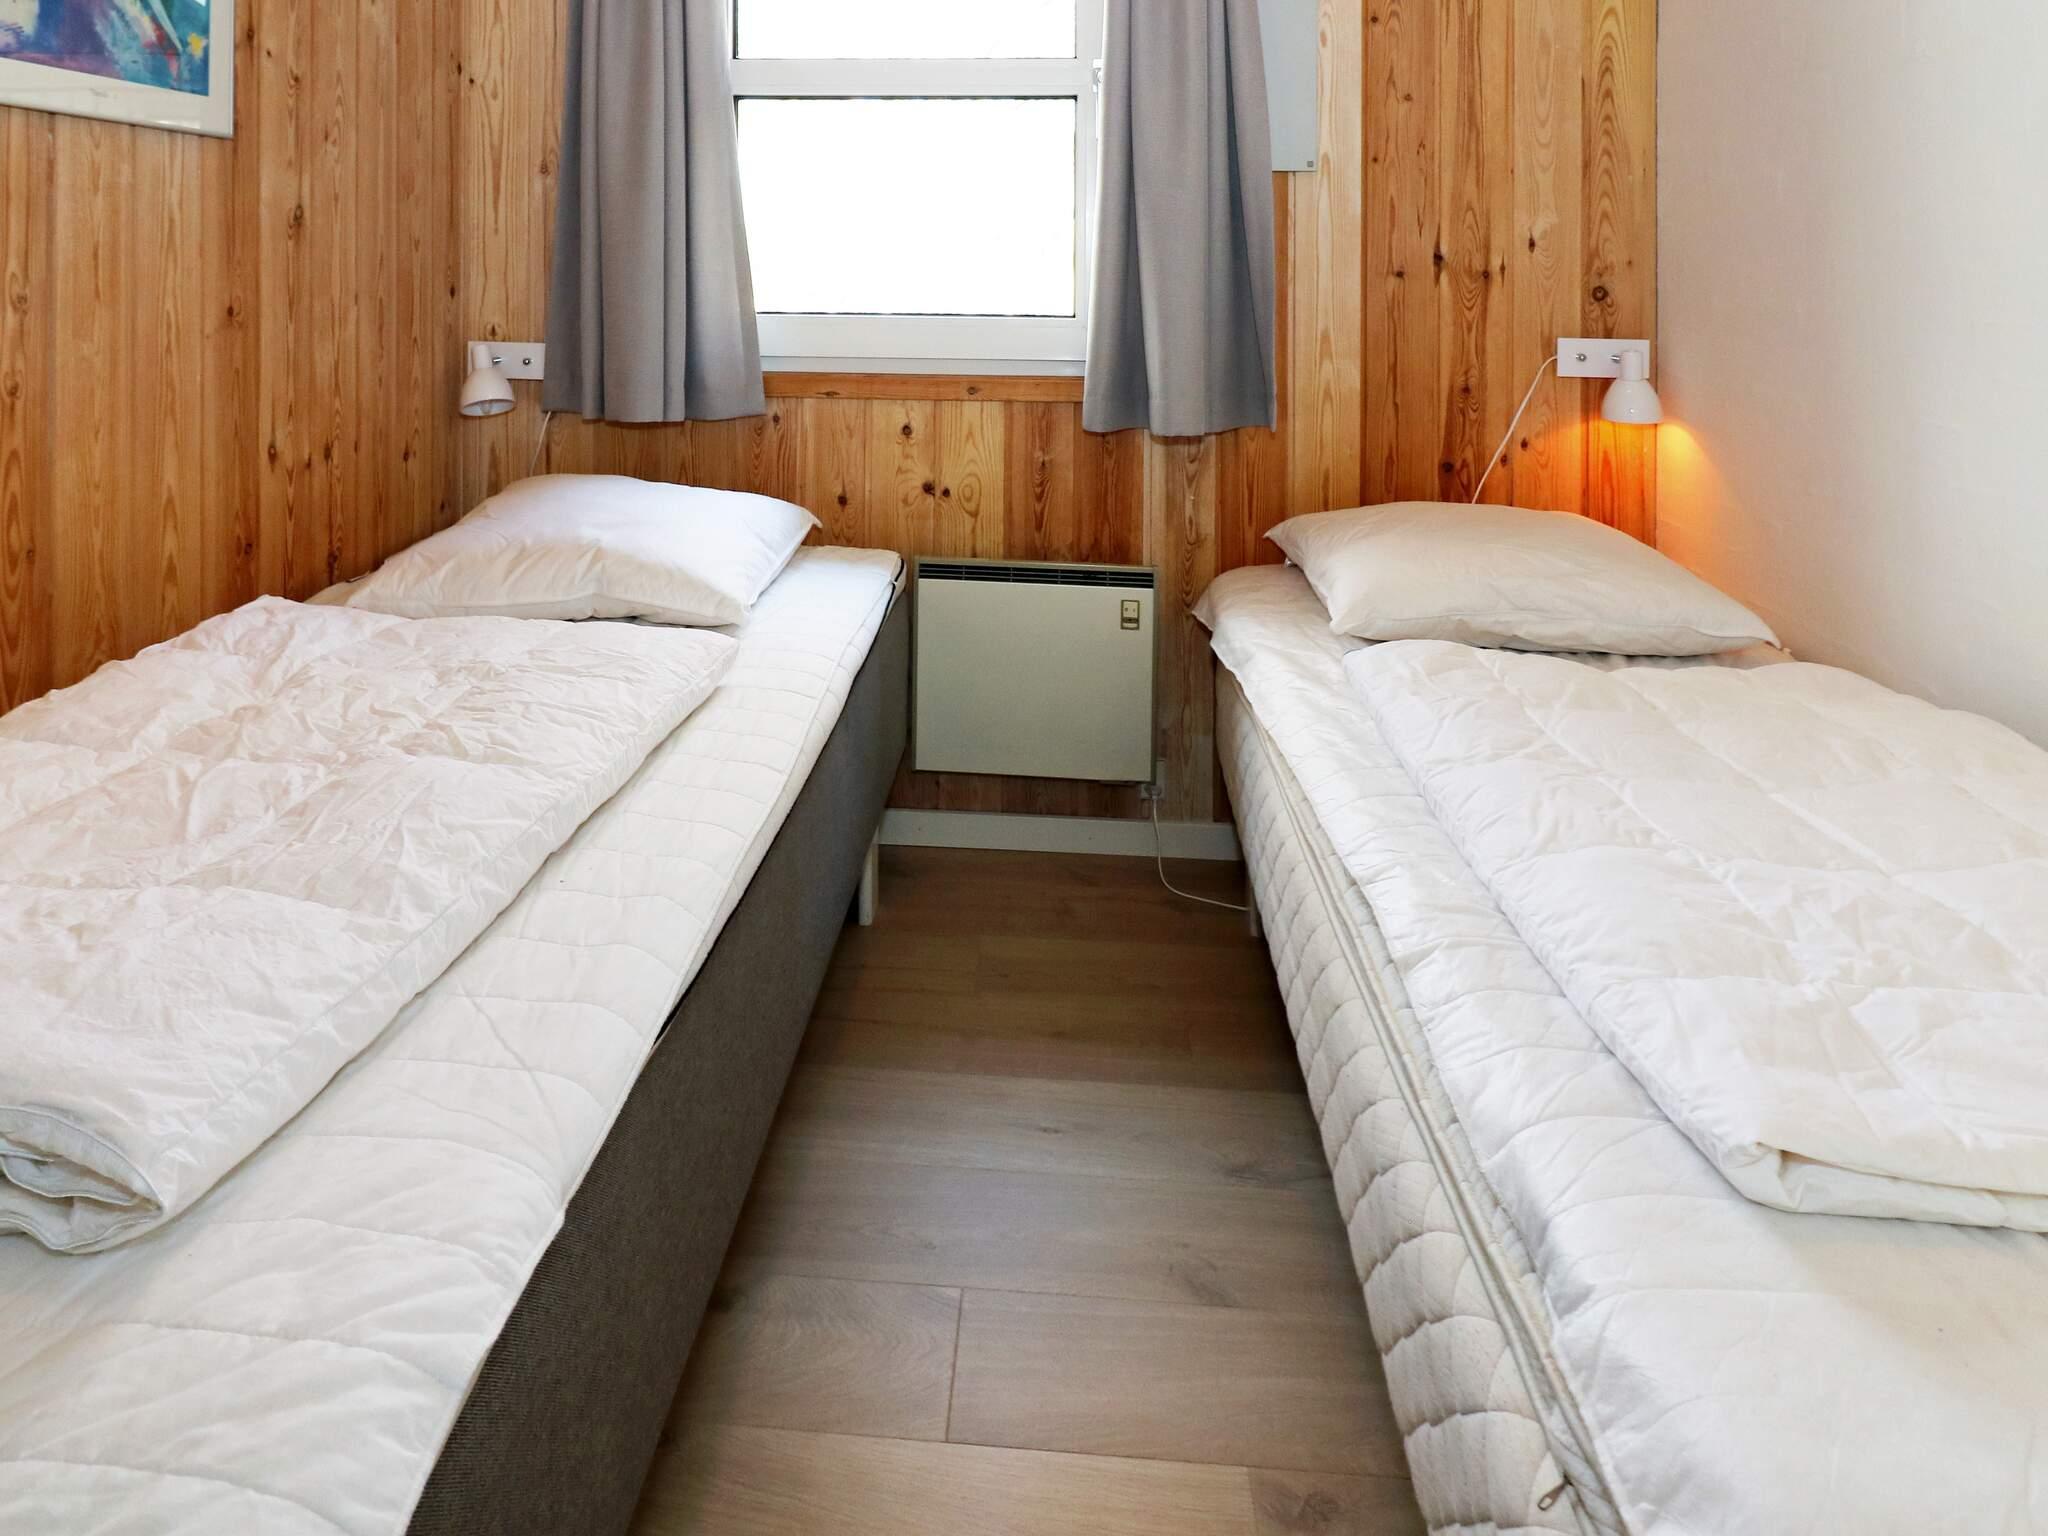 Ferienhaus Øster Hurup (89295), Øster Hurup, , Dänische Ostsee, Dänemark, Bild 12